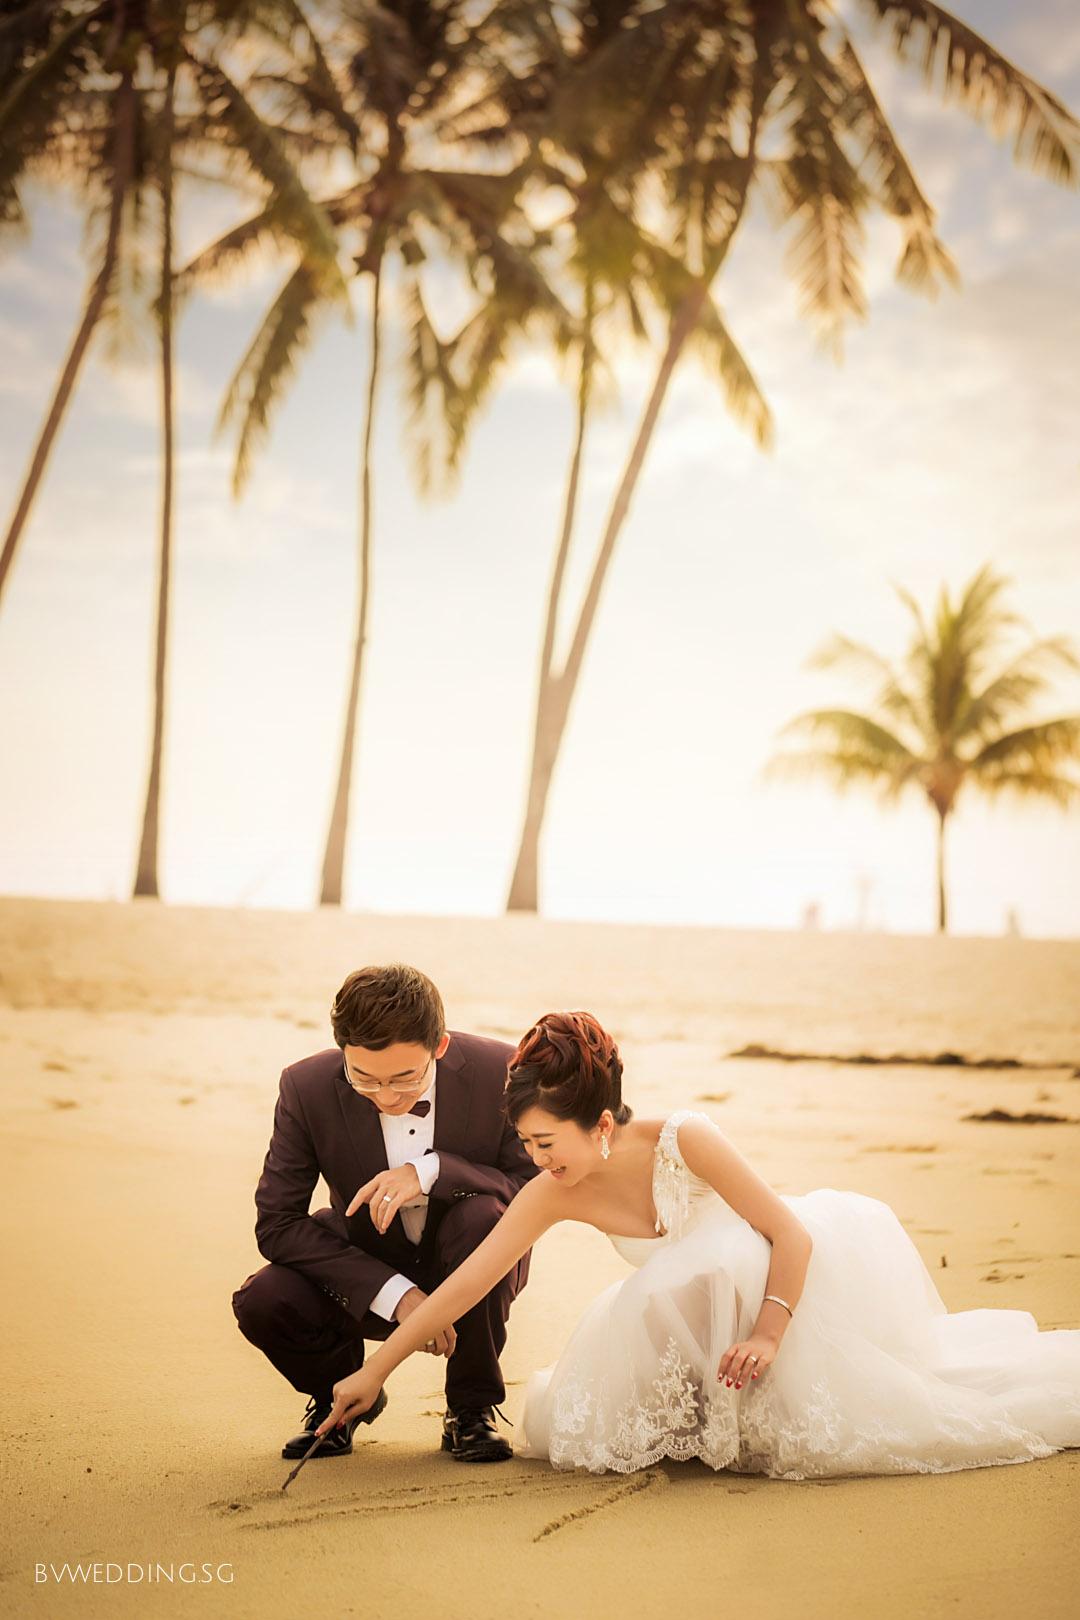 Pre-wedding Photoshoot at Sentosa